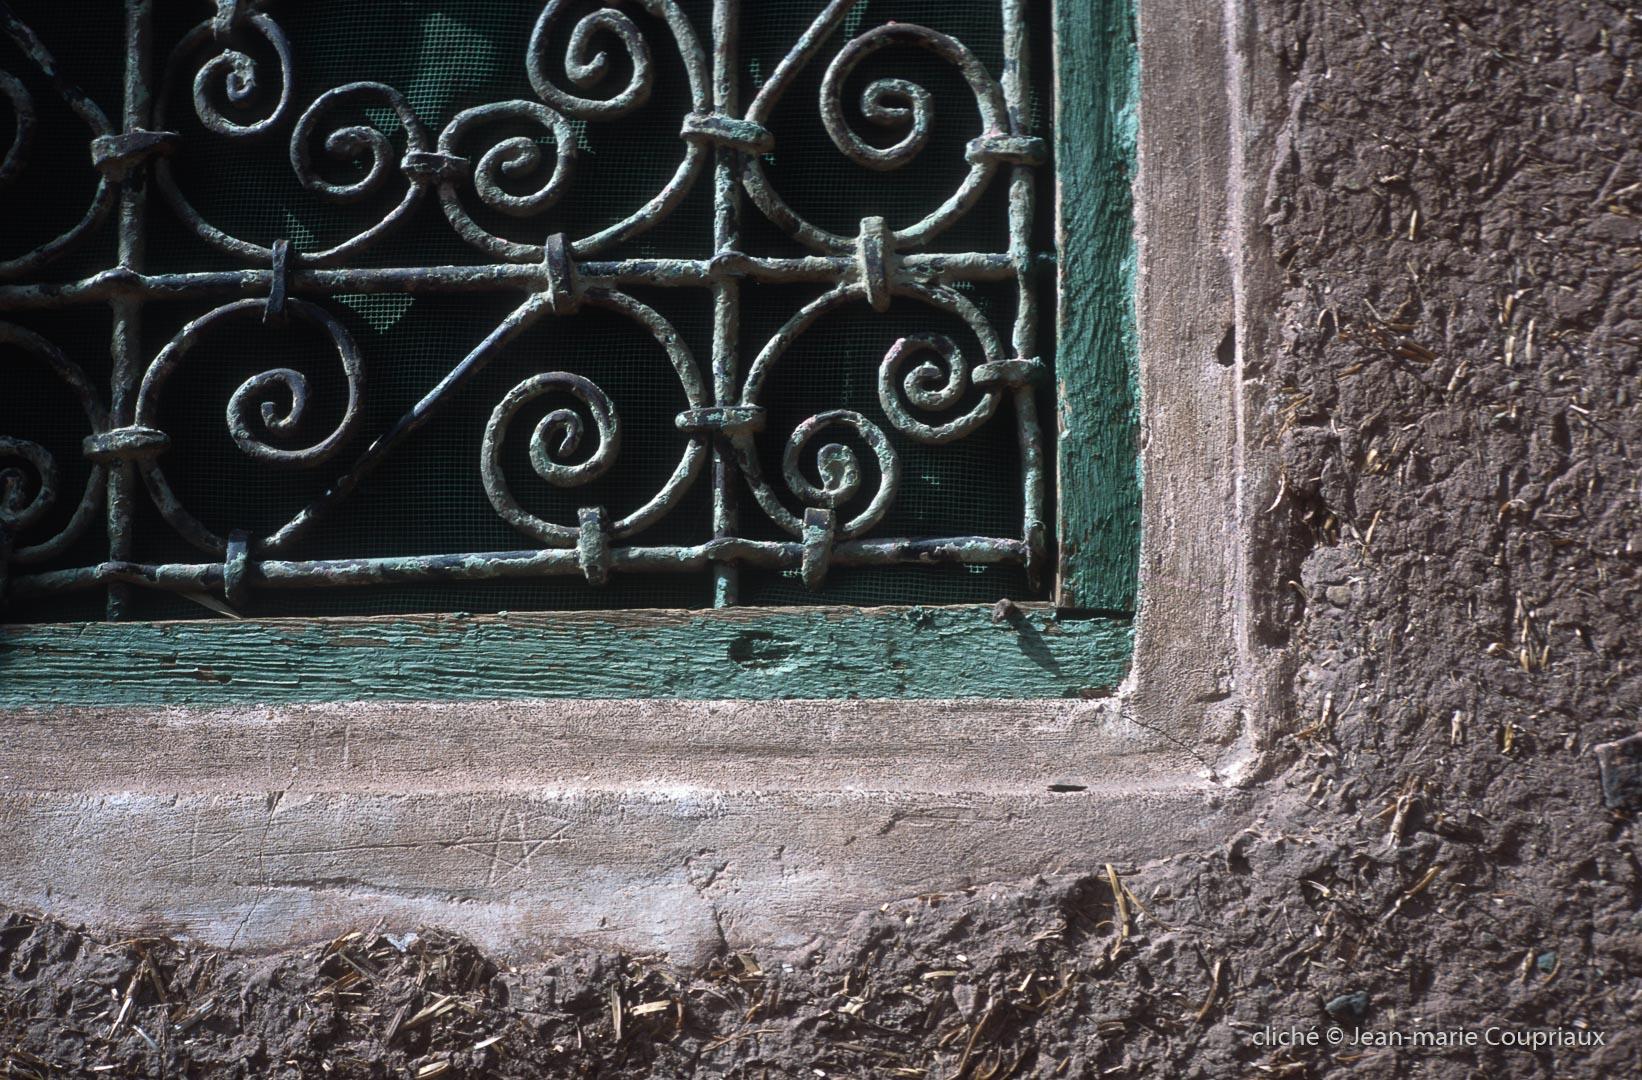 Maroc_fenetre-422